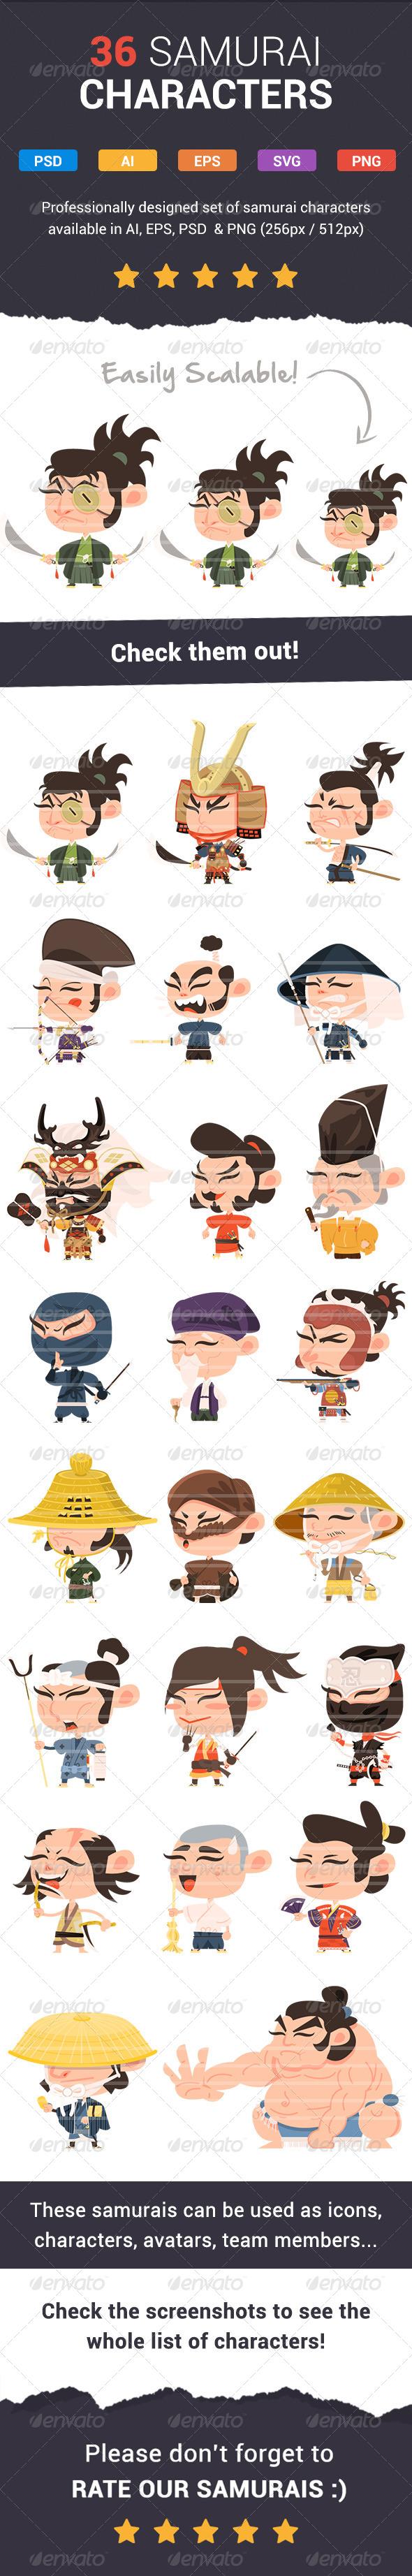 36 Fresh Samurai Characters - Characters Vectors